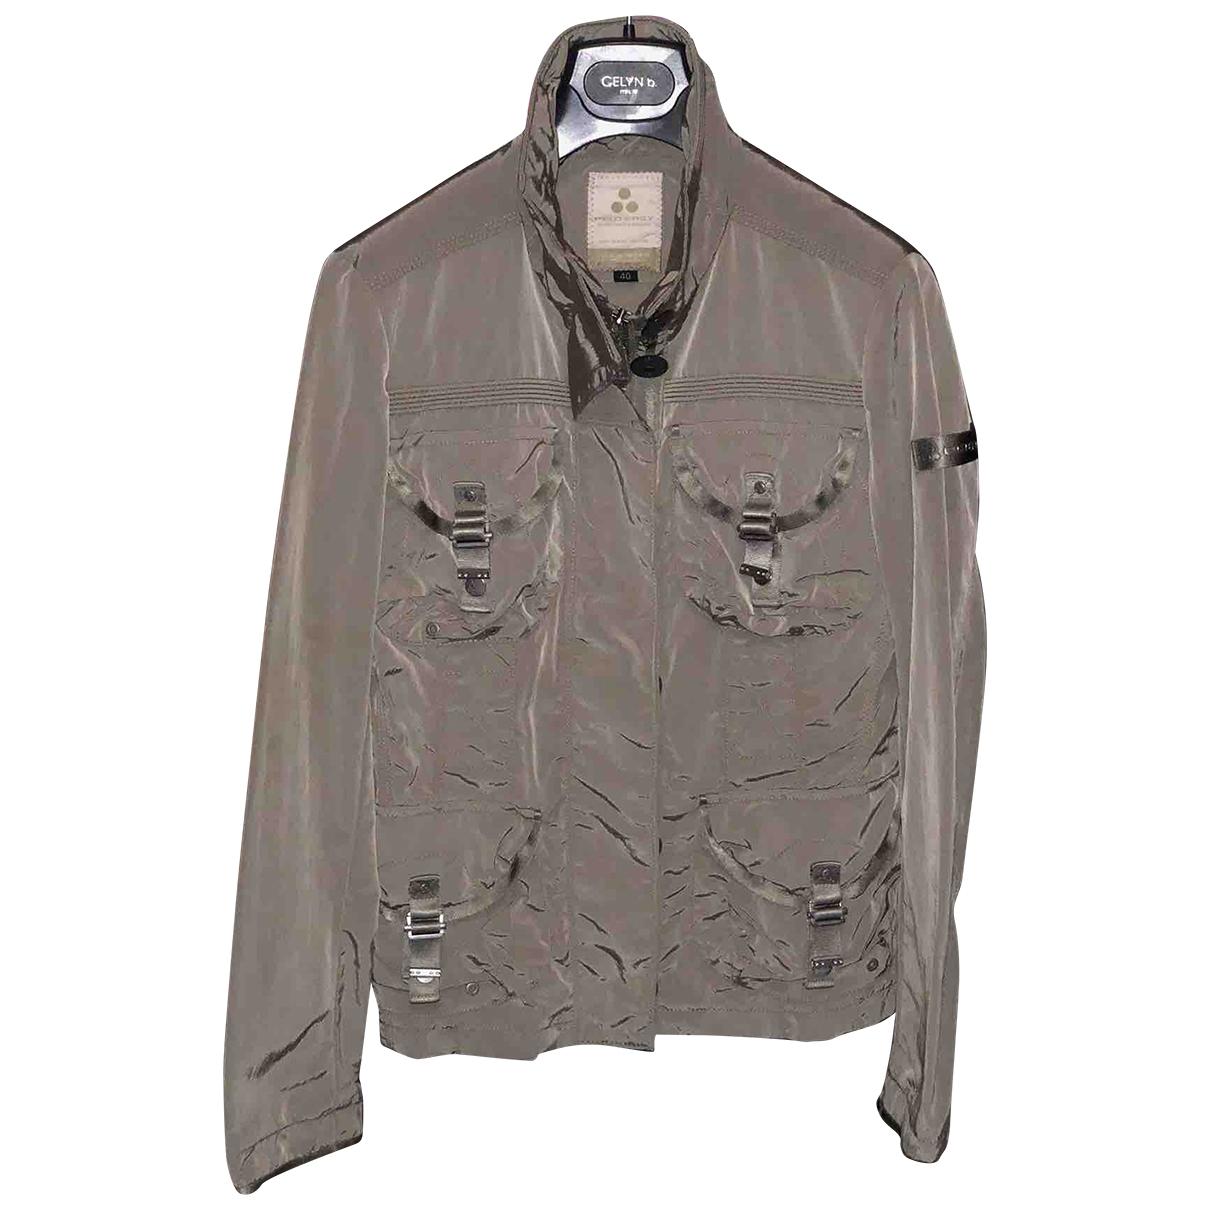 Peuterey \N Grey jacket for Women 40 IT